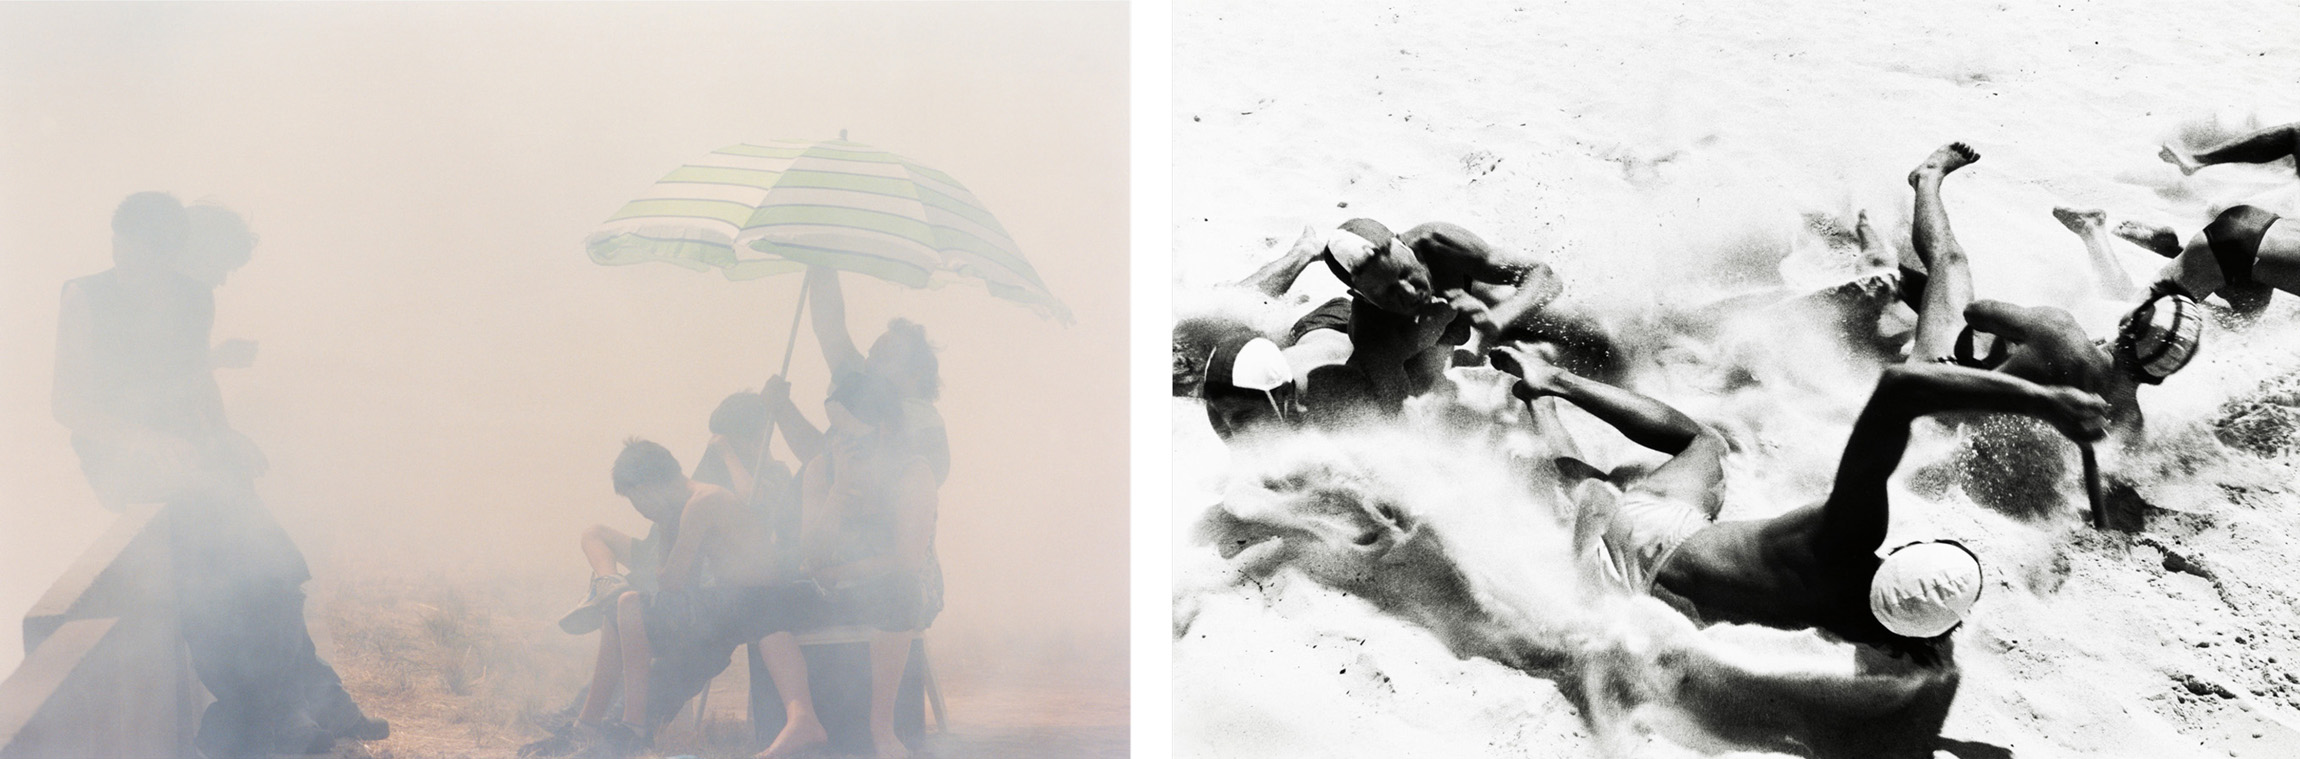 iris, irismagazine, iris magazine, Paul Blackmore, Michael Corridore, Australian Photography